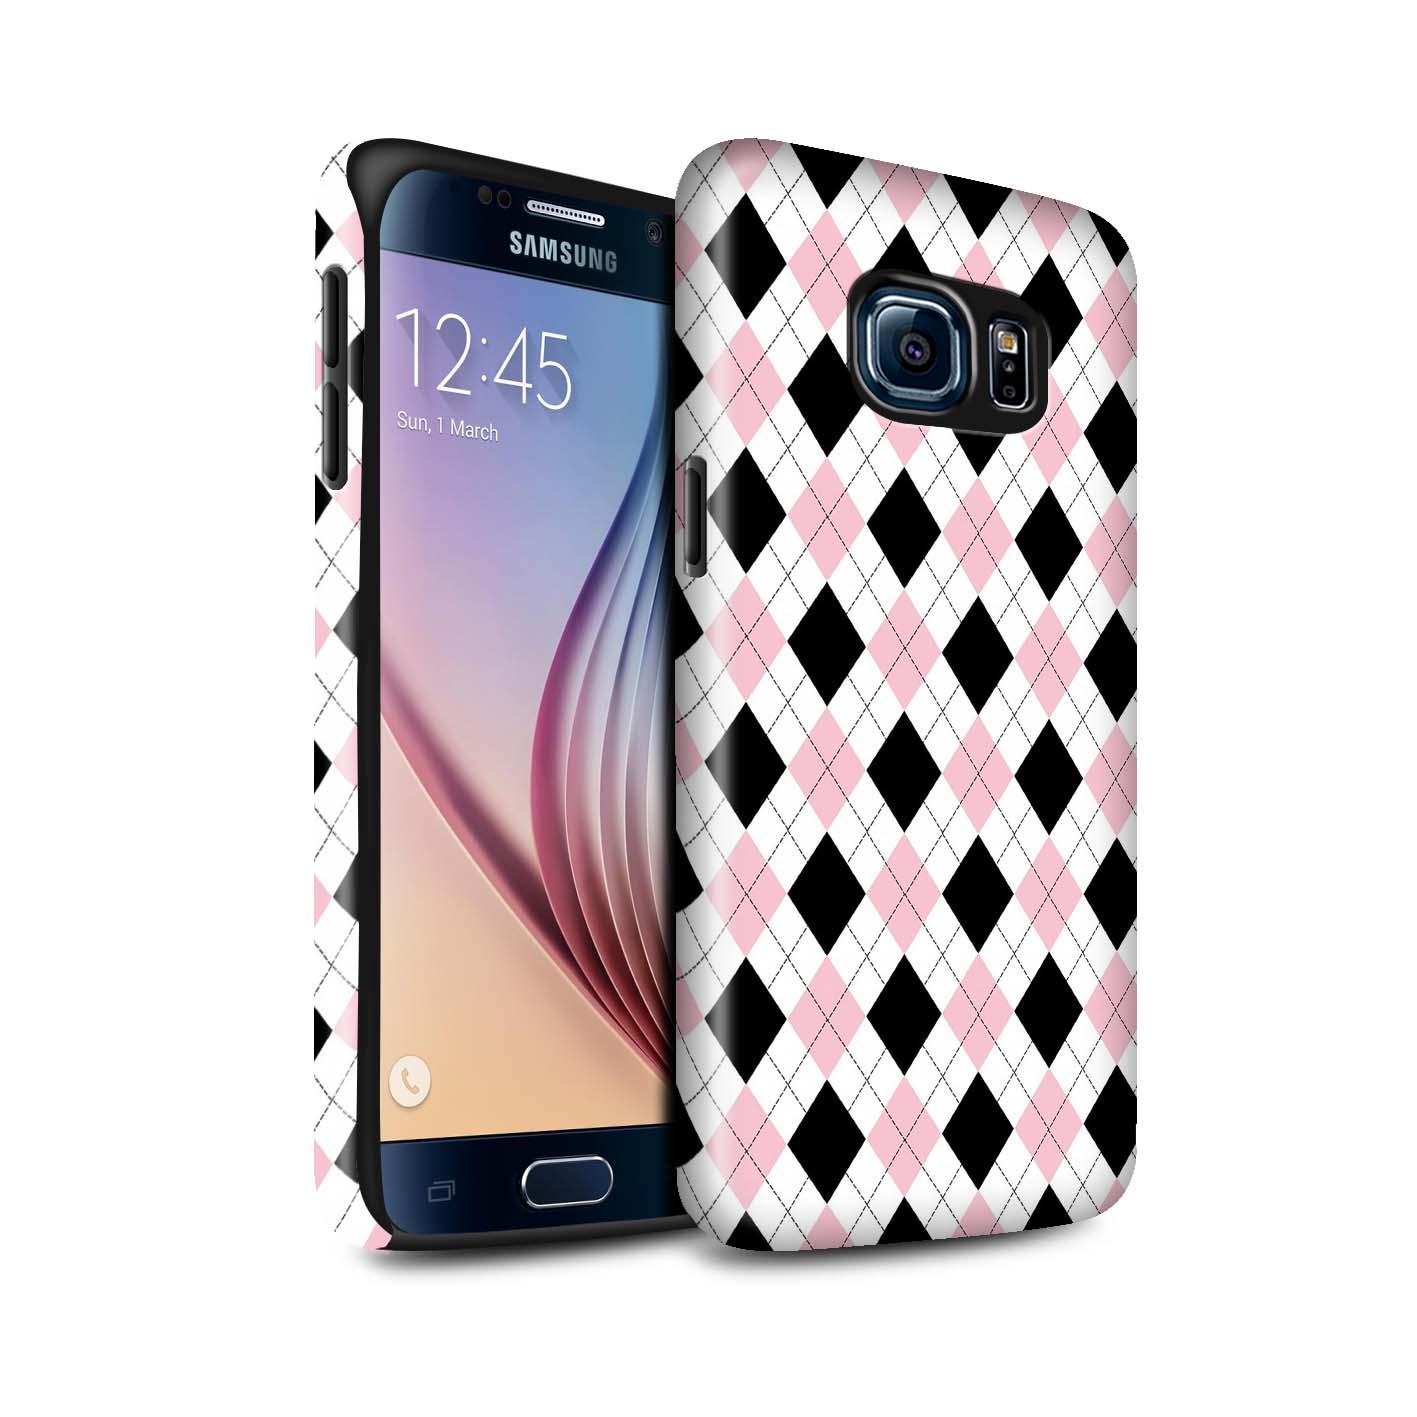 Robuste-Brillant-Coque-Etui-STUFF4-pour-Samsung-Galaxy-S6-G920-Mode-Hivernale